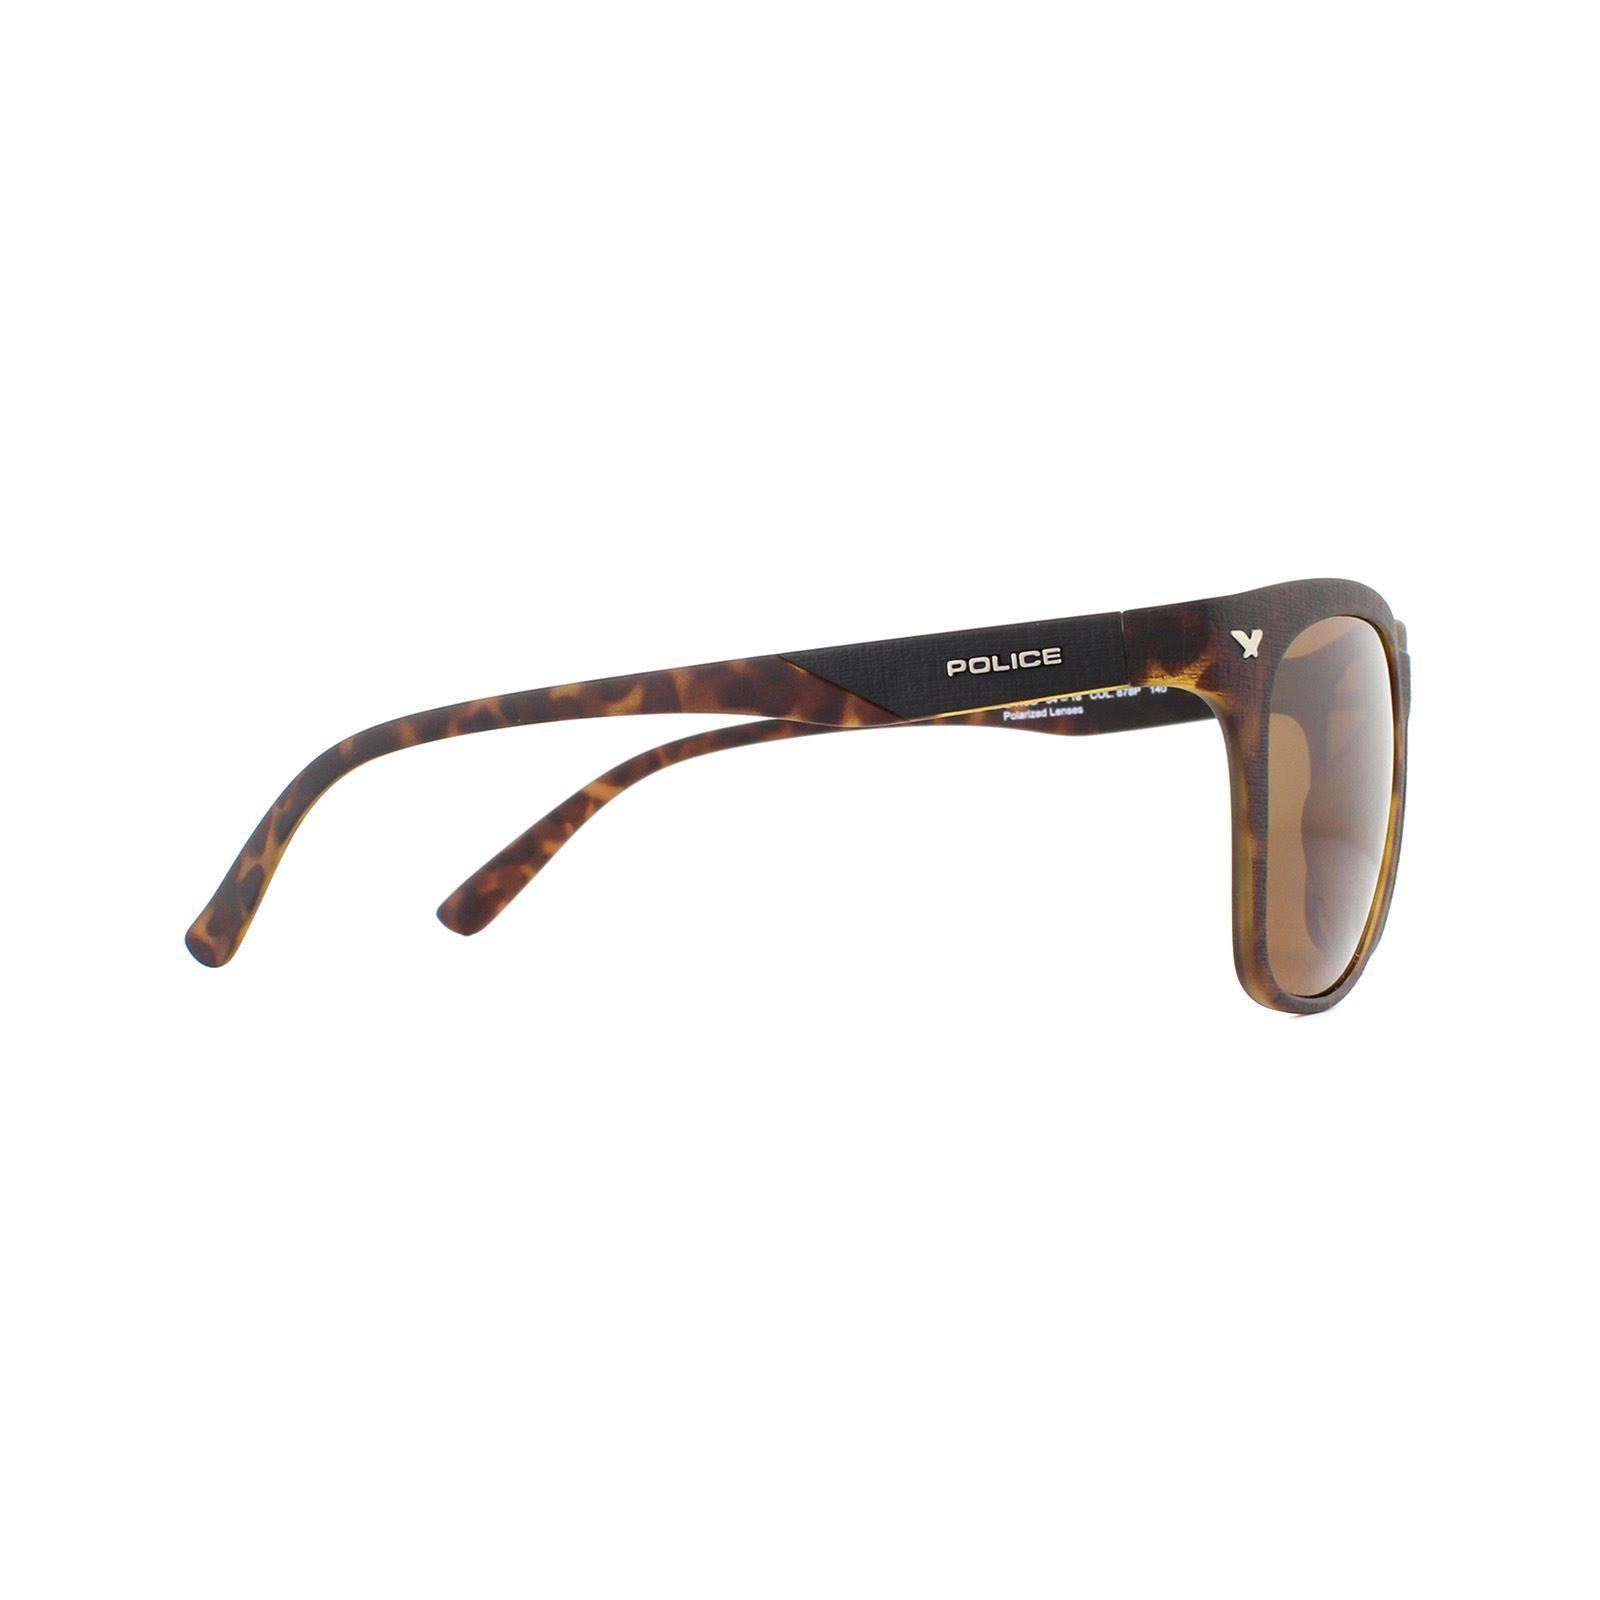 Police Sunglasses SPL113G Game 8 878P Matte Havana Brown Polarized